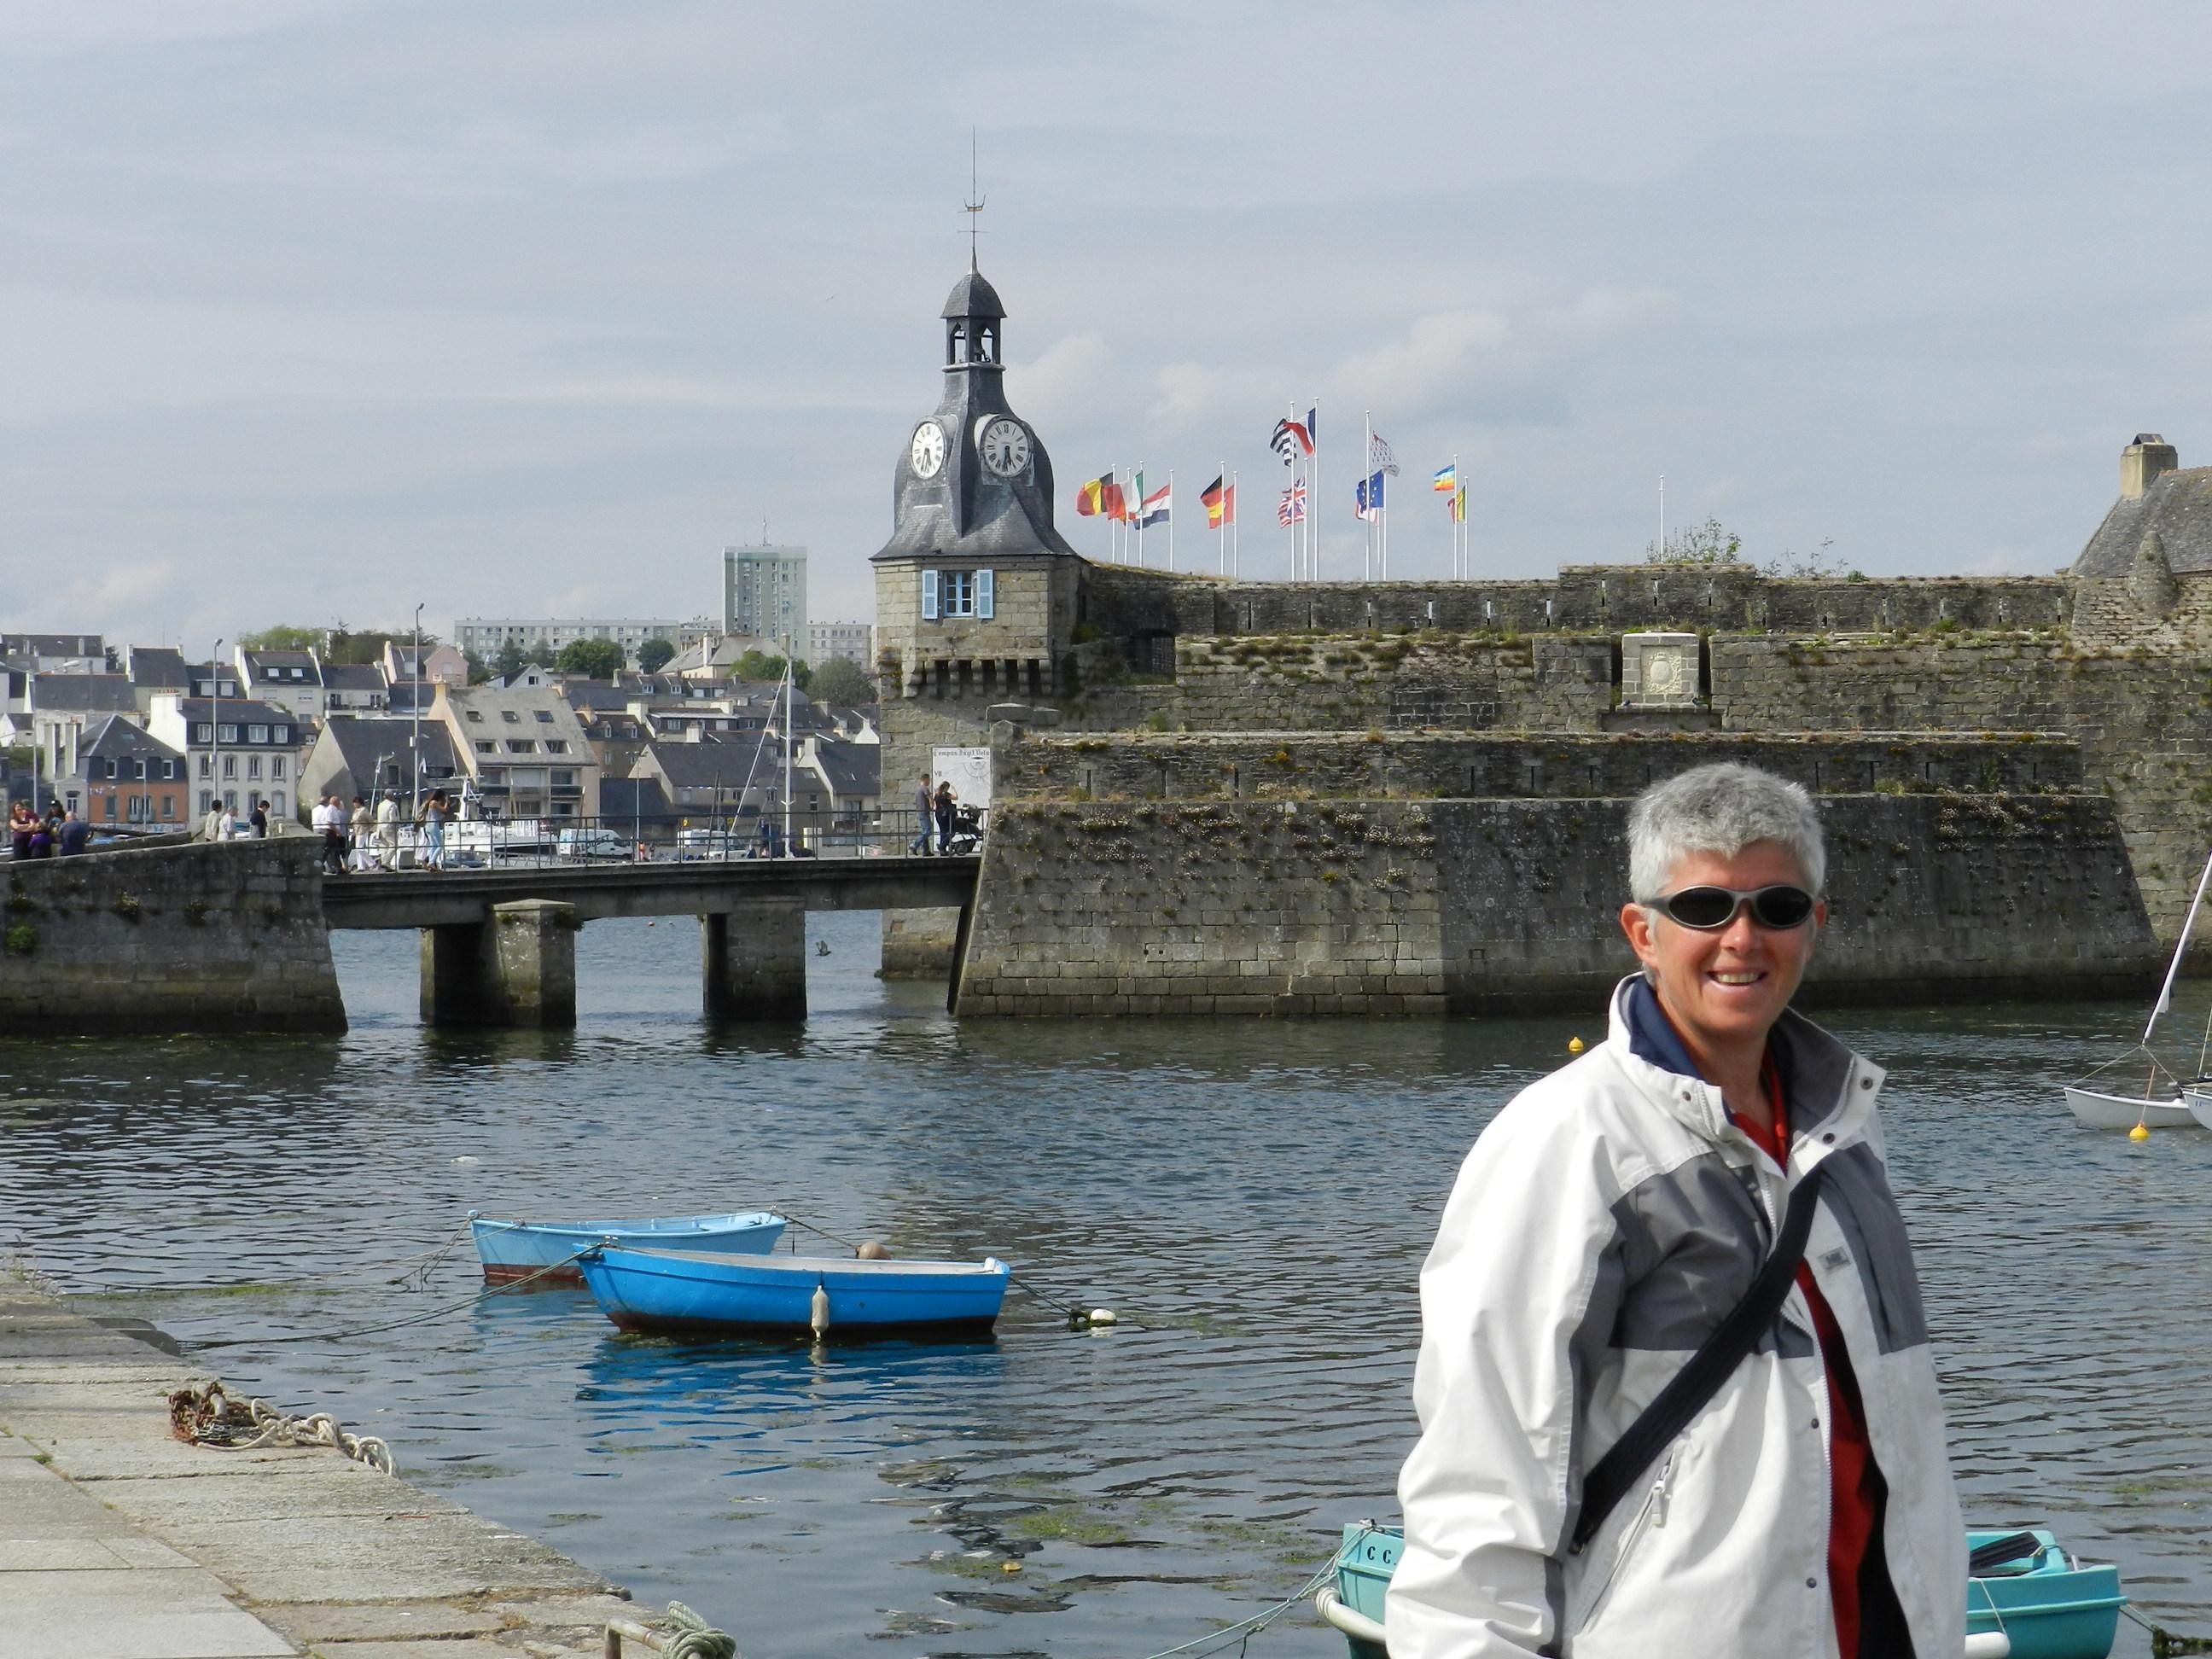 Personals in harbour breton